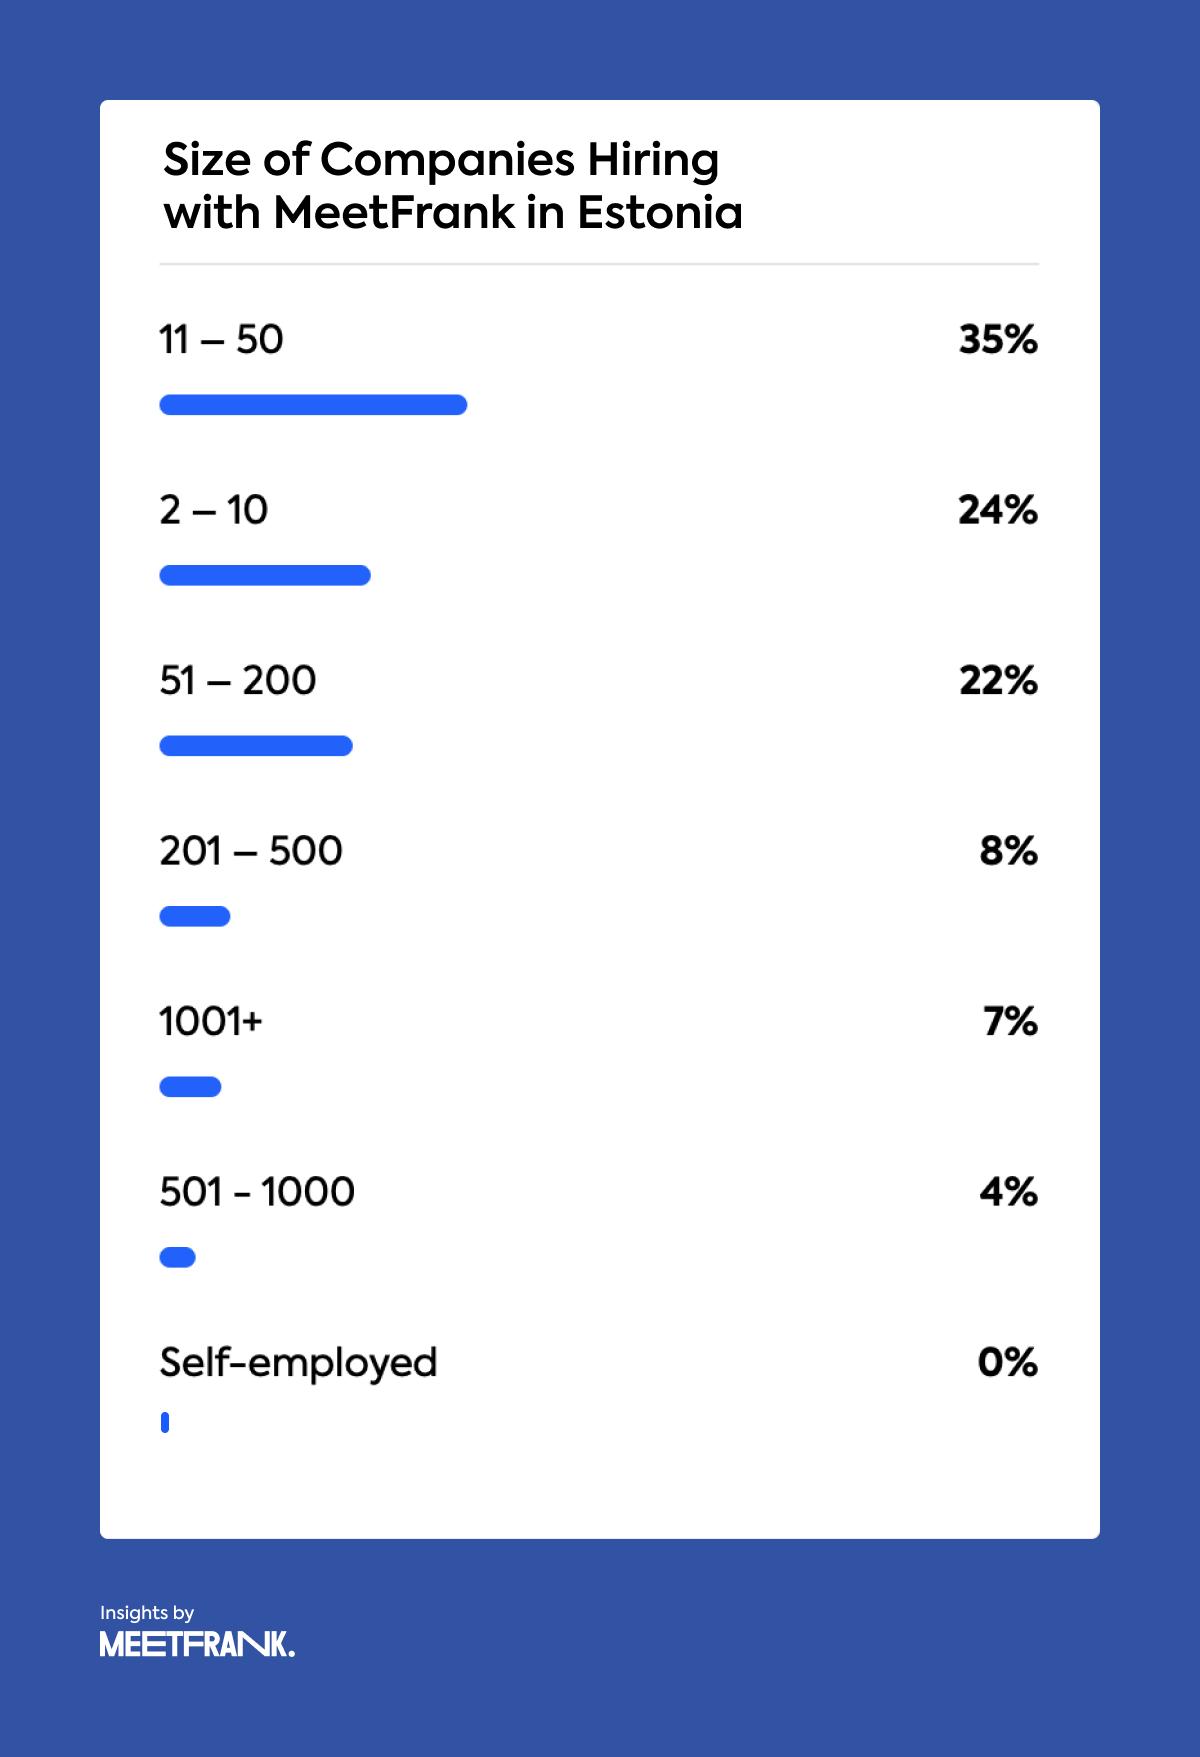 size of Estonia-based companies